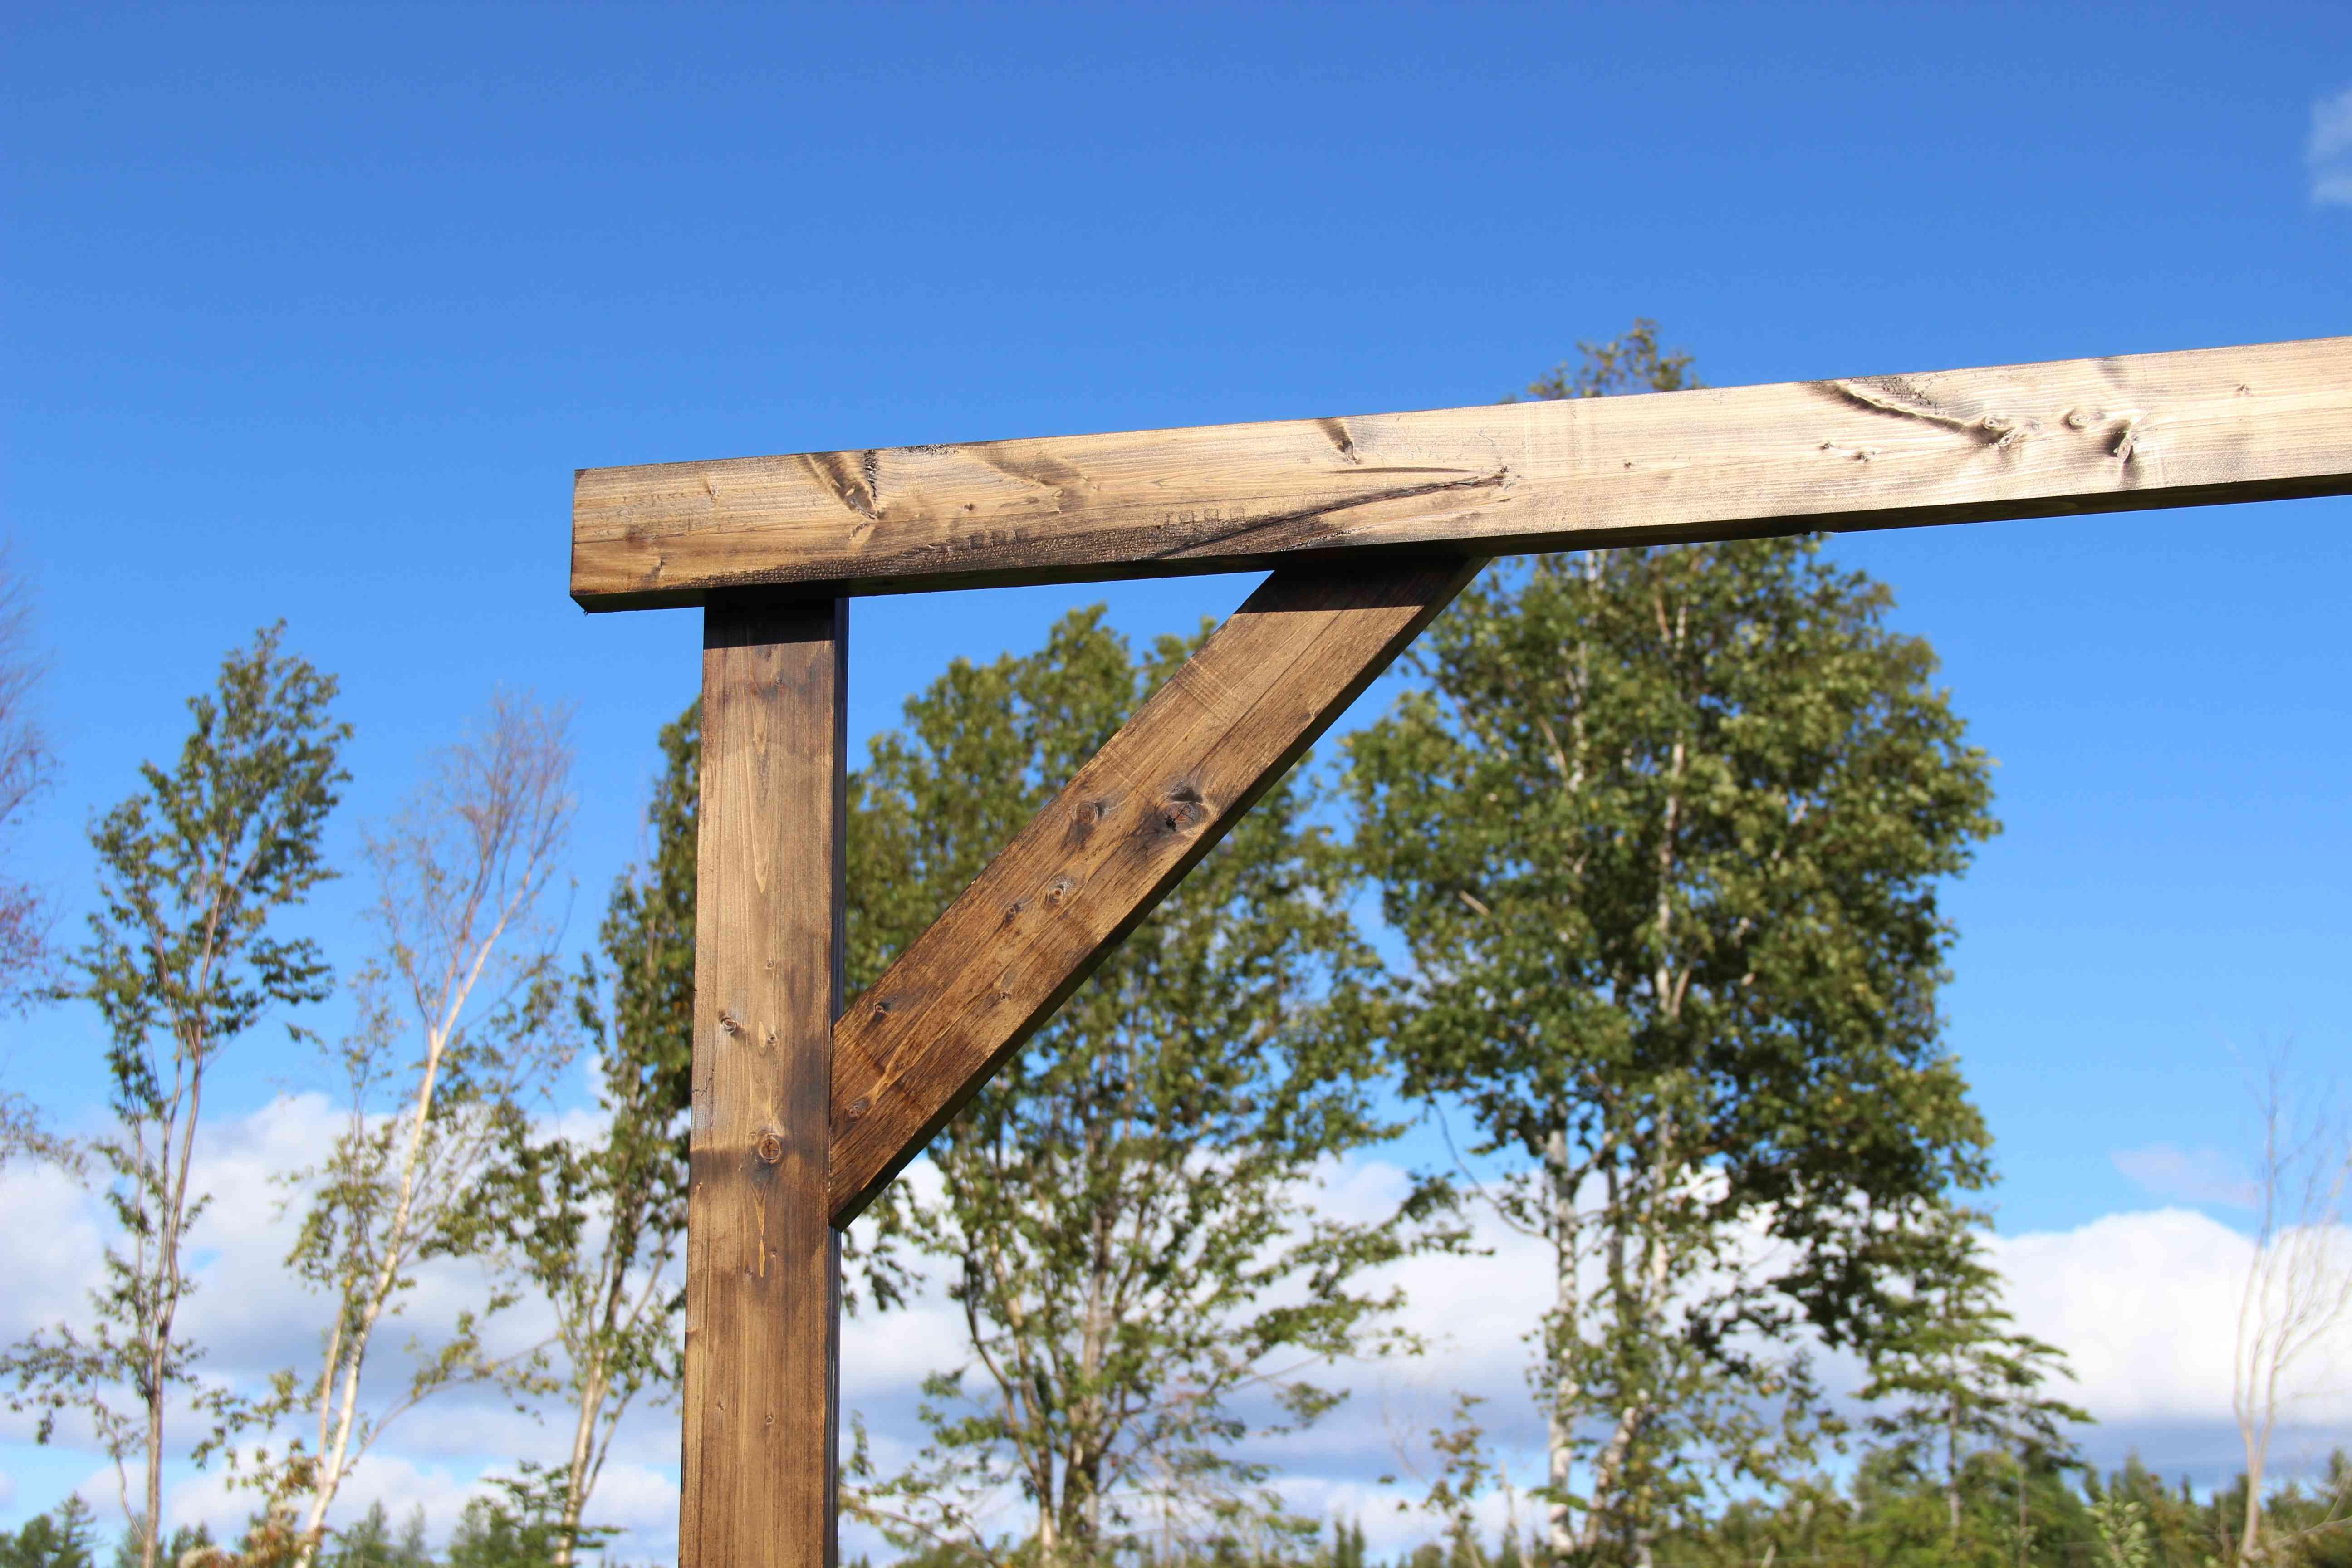 A close-up of a wooden arbor